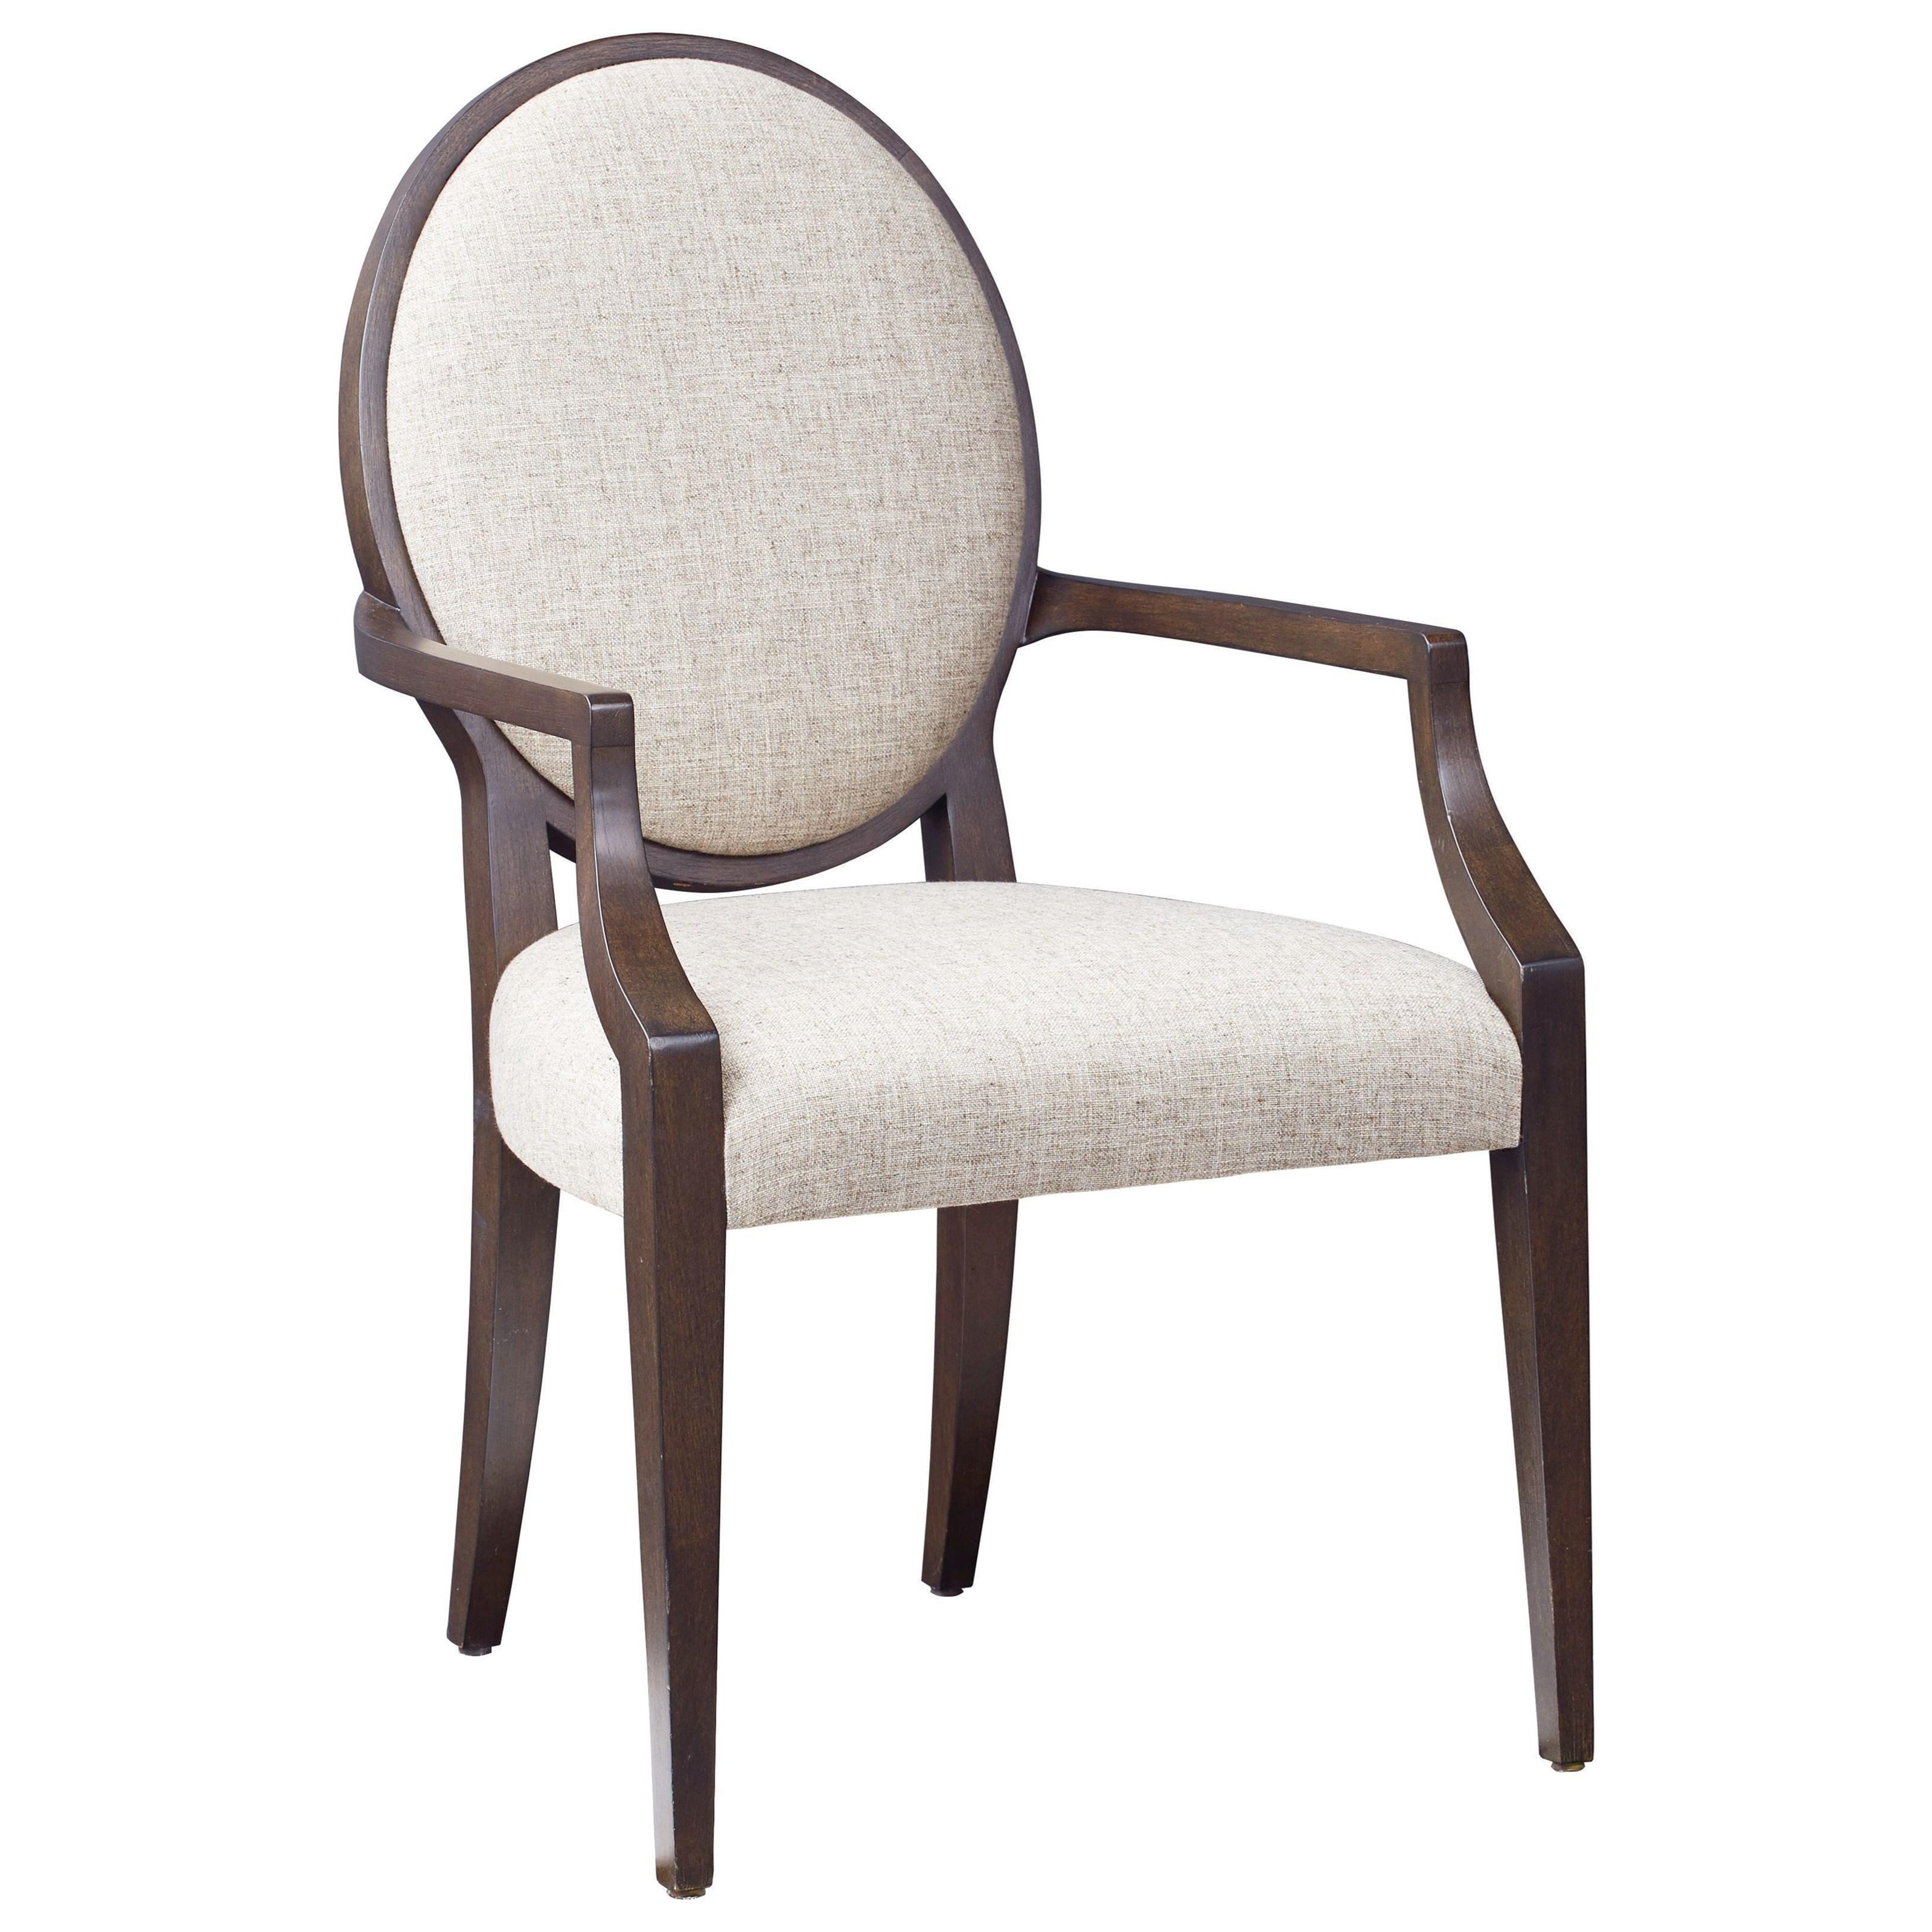 Modern - Astor and Rivoli Arm Chair by Bassett at Bassett of Cool Springs